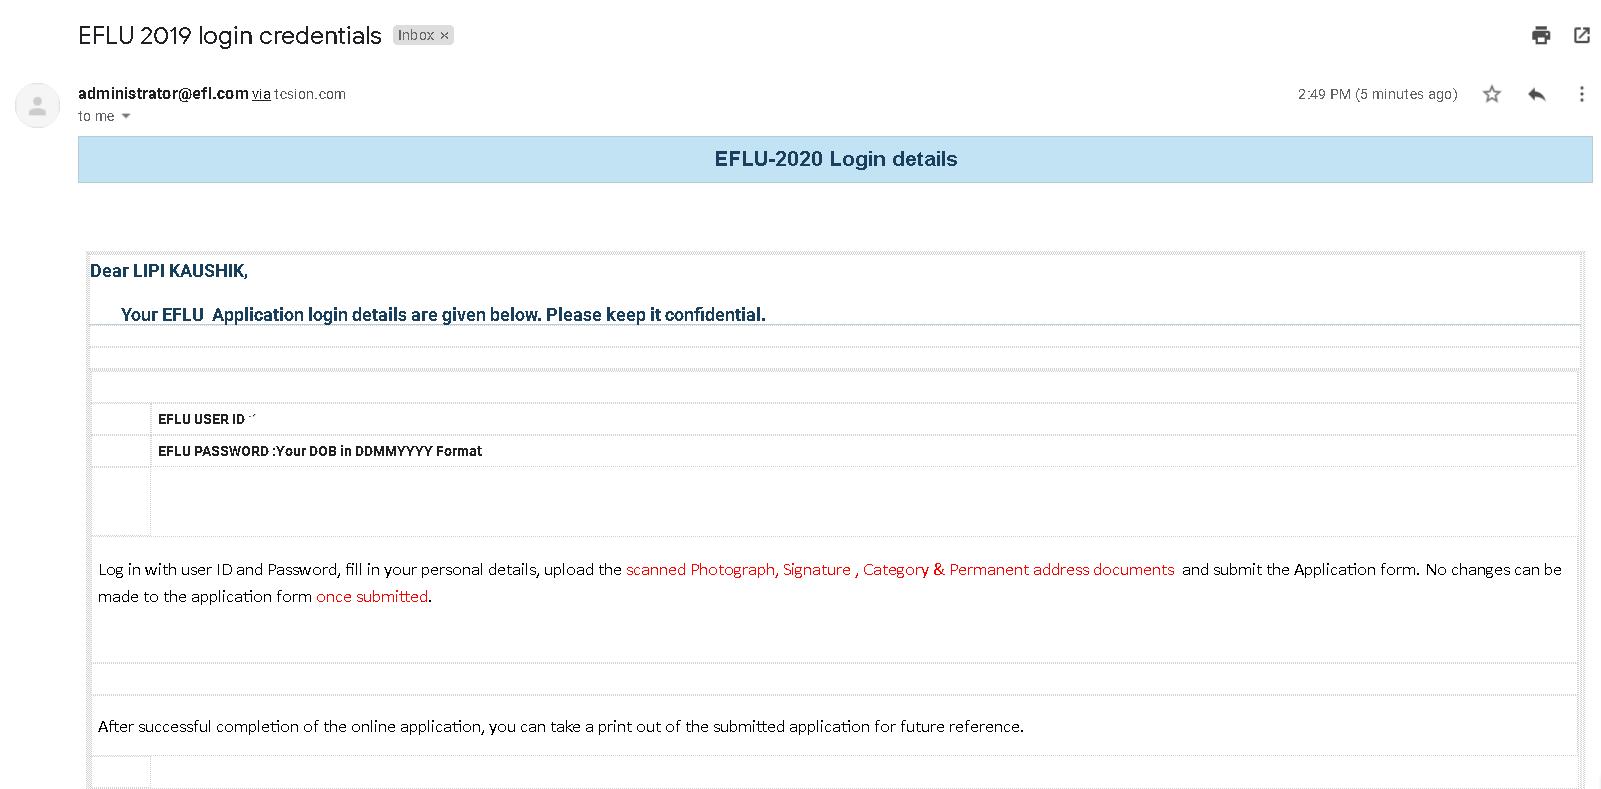 EFLU Application Form E-Mail